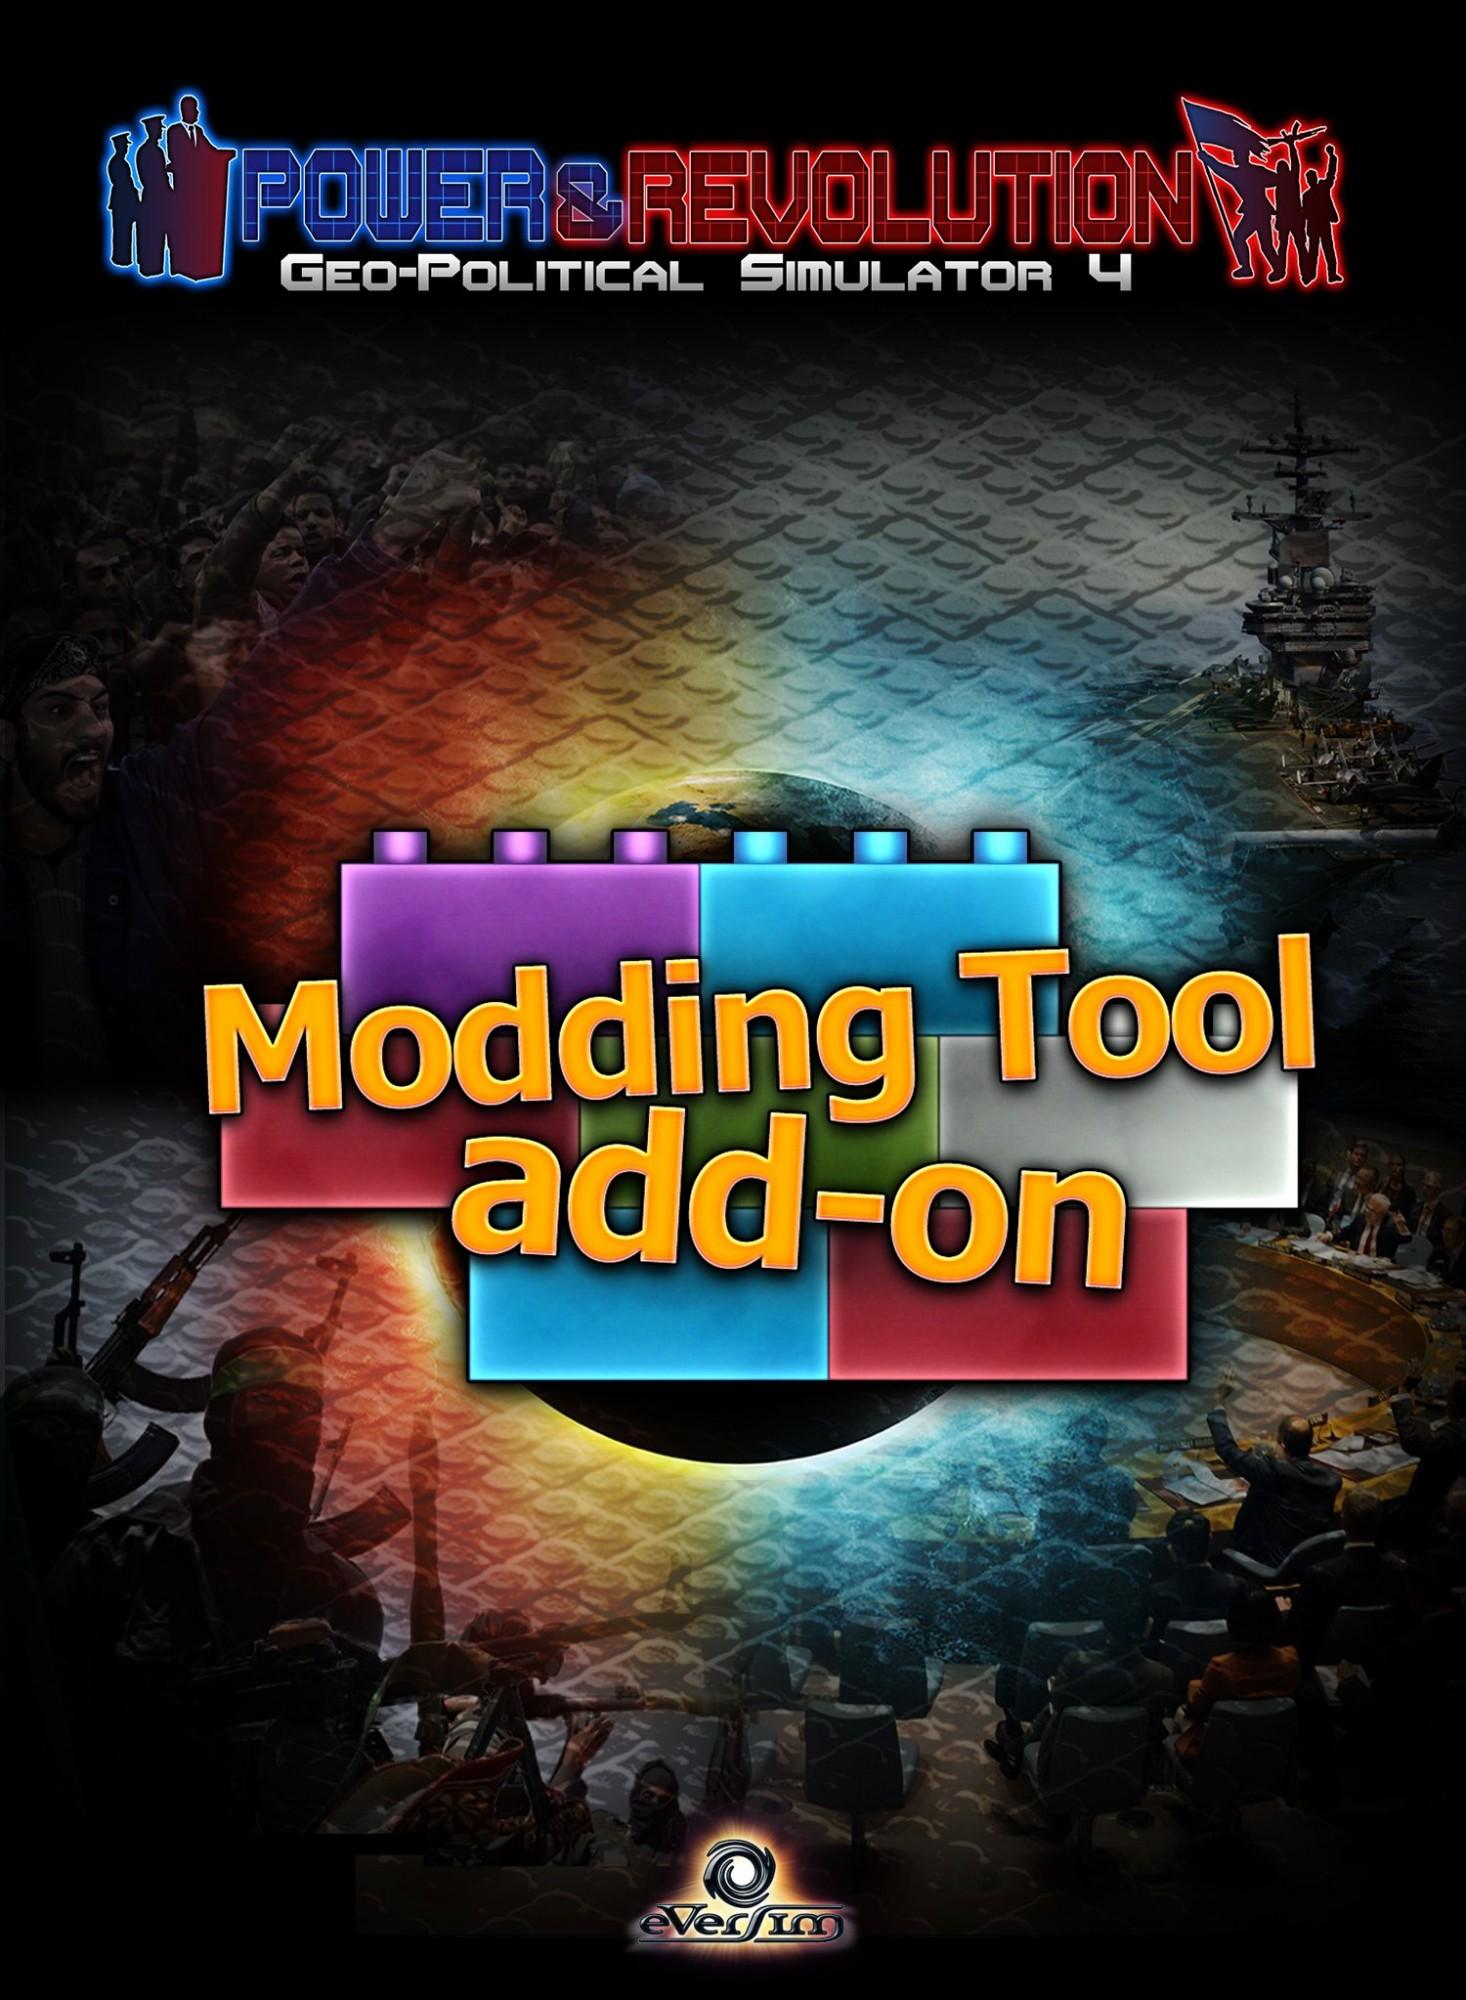 Nexway Power & Revolution: Geo-Political Simulator 4 Modding tooll add-on, PC Video game downloadable content (DLC) Español